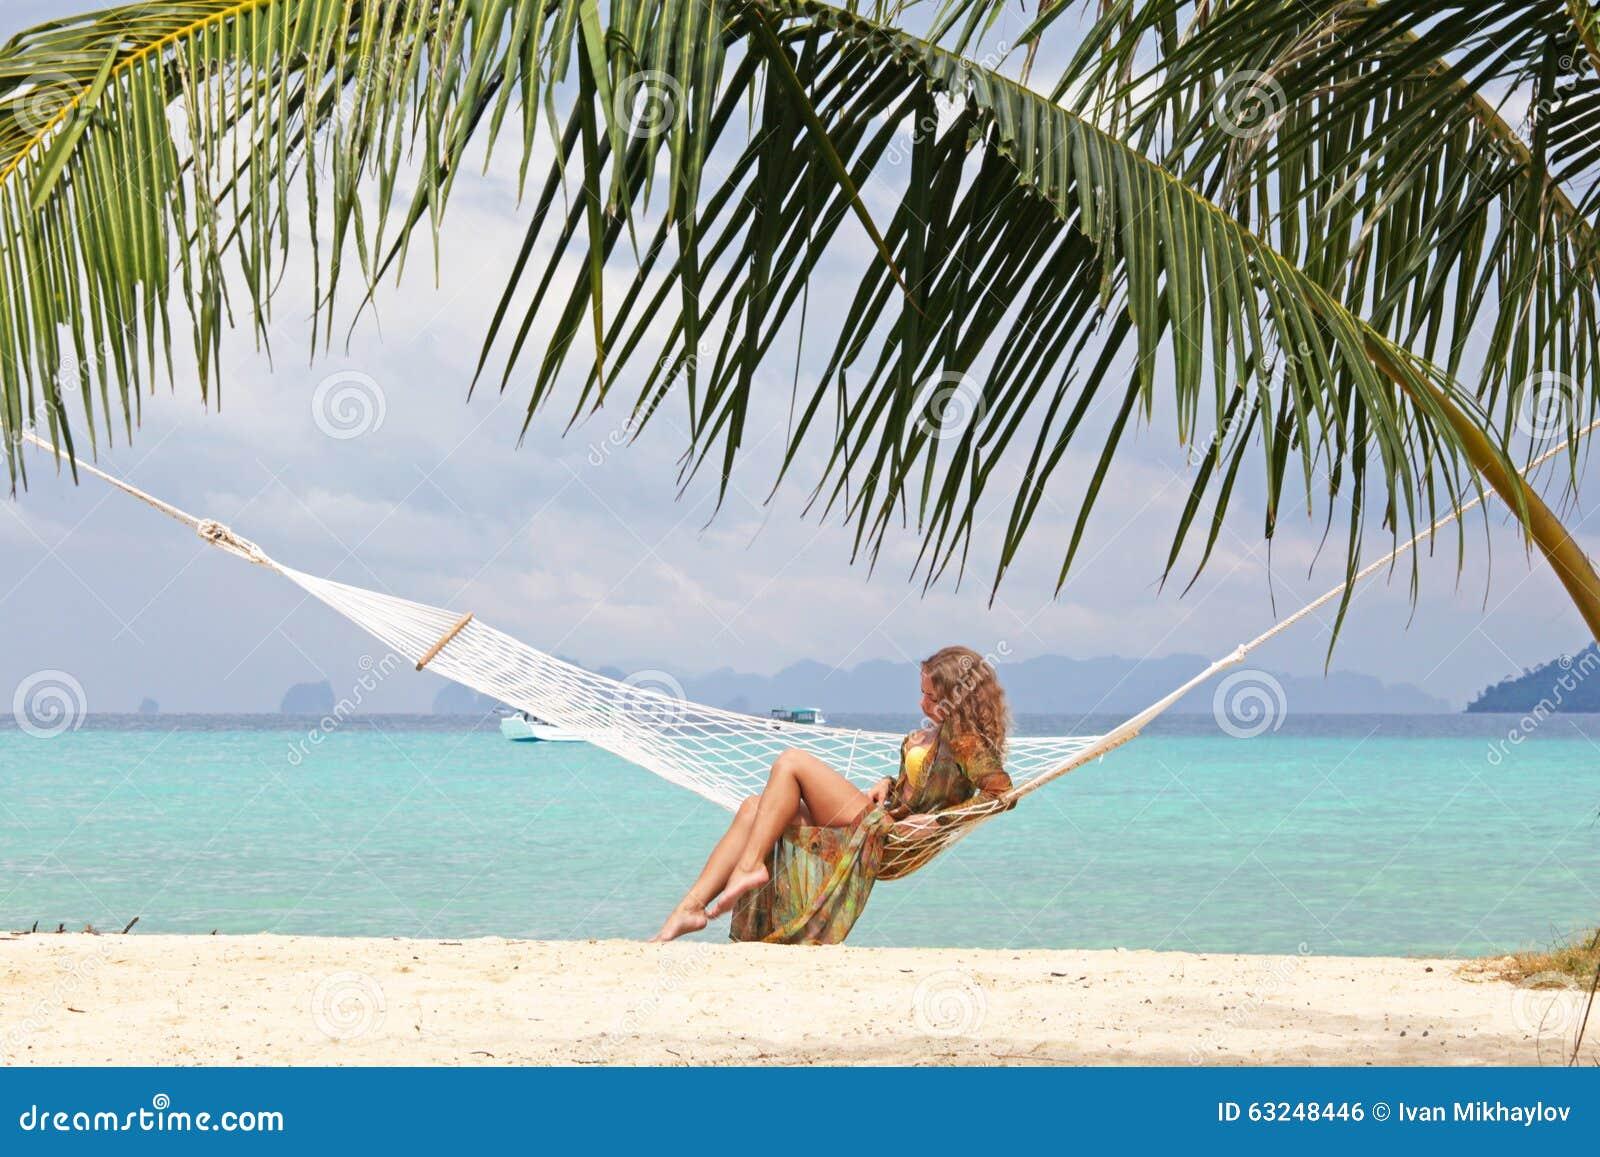 Palm Beach Tan Prices >> Woman on tropical beach stock photo. Image of hammock - 63248446